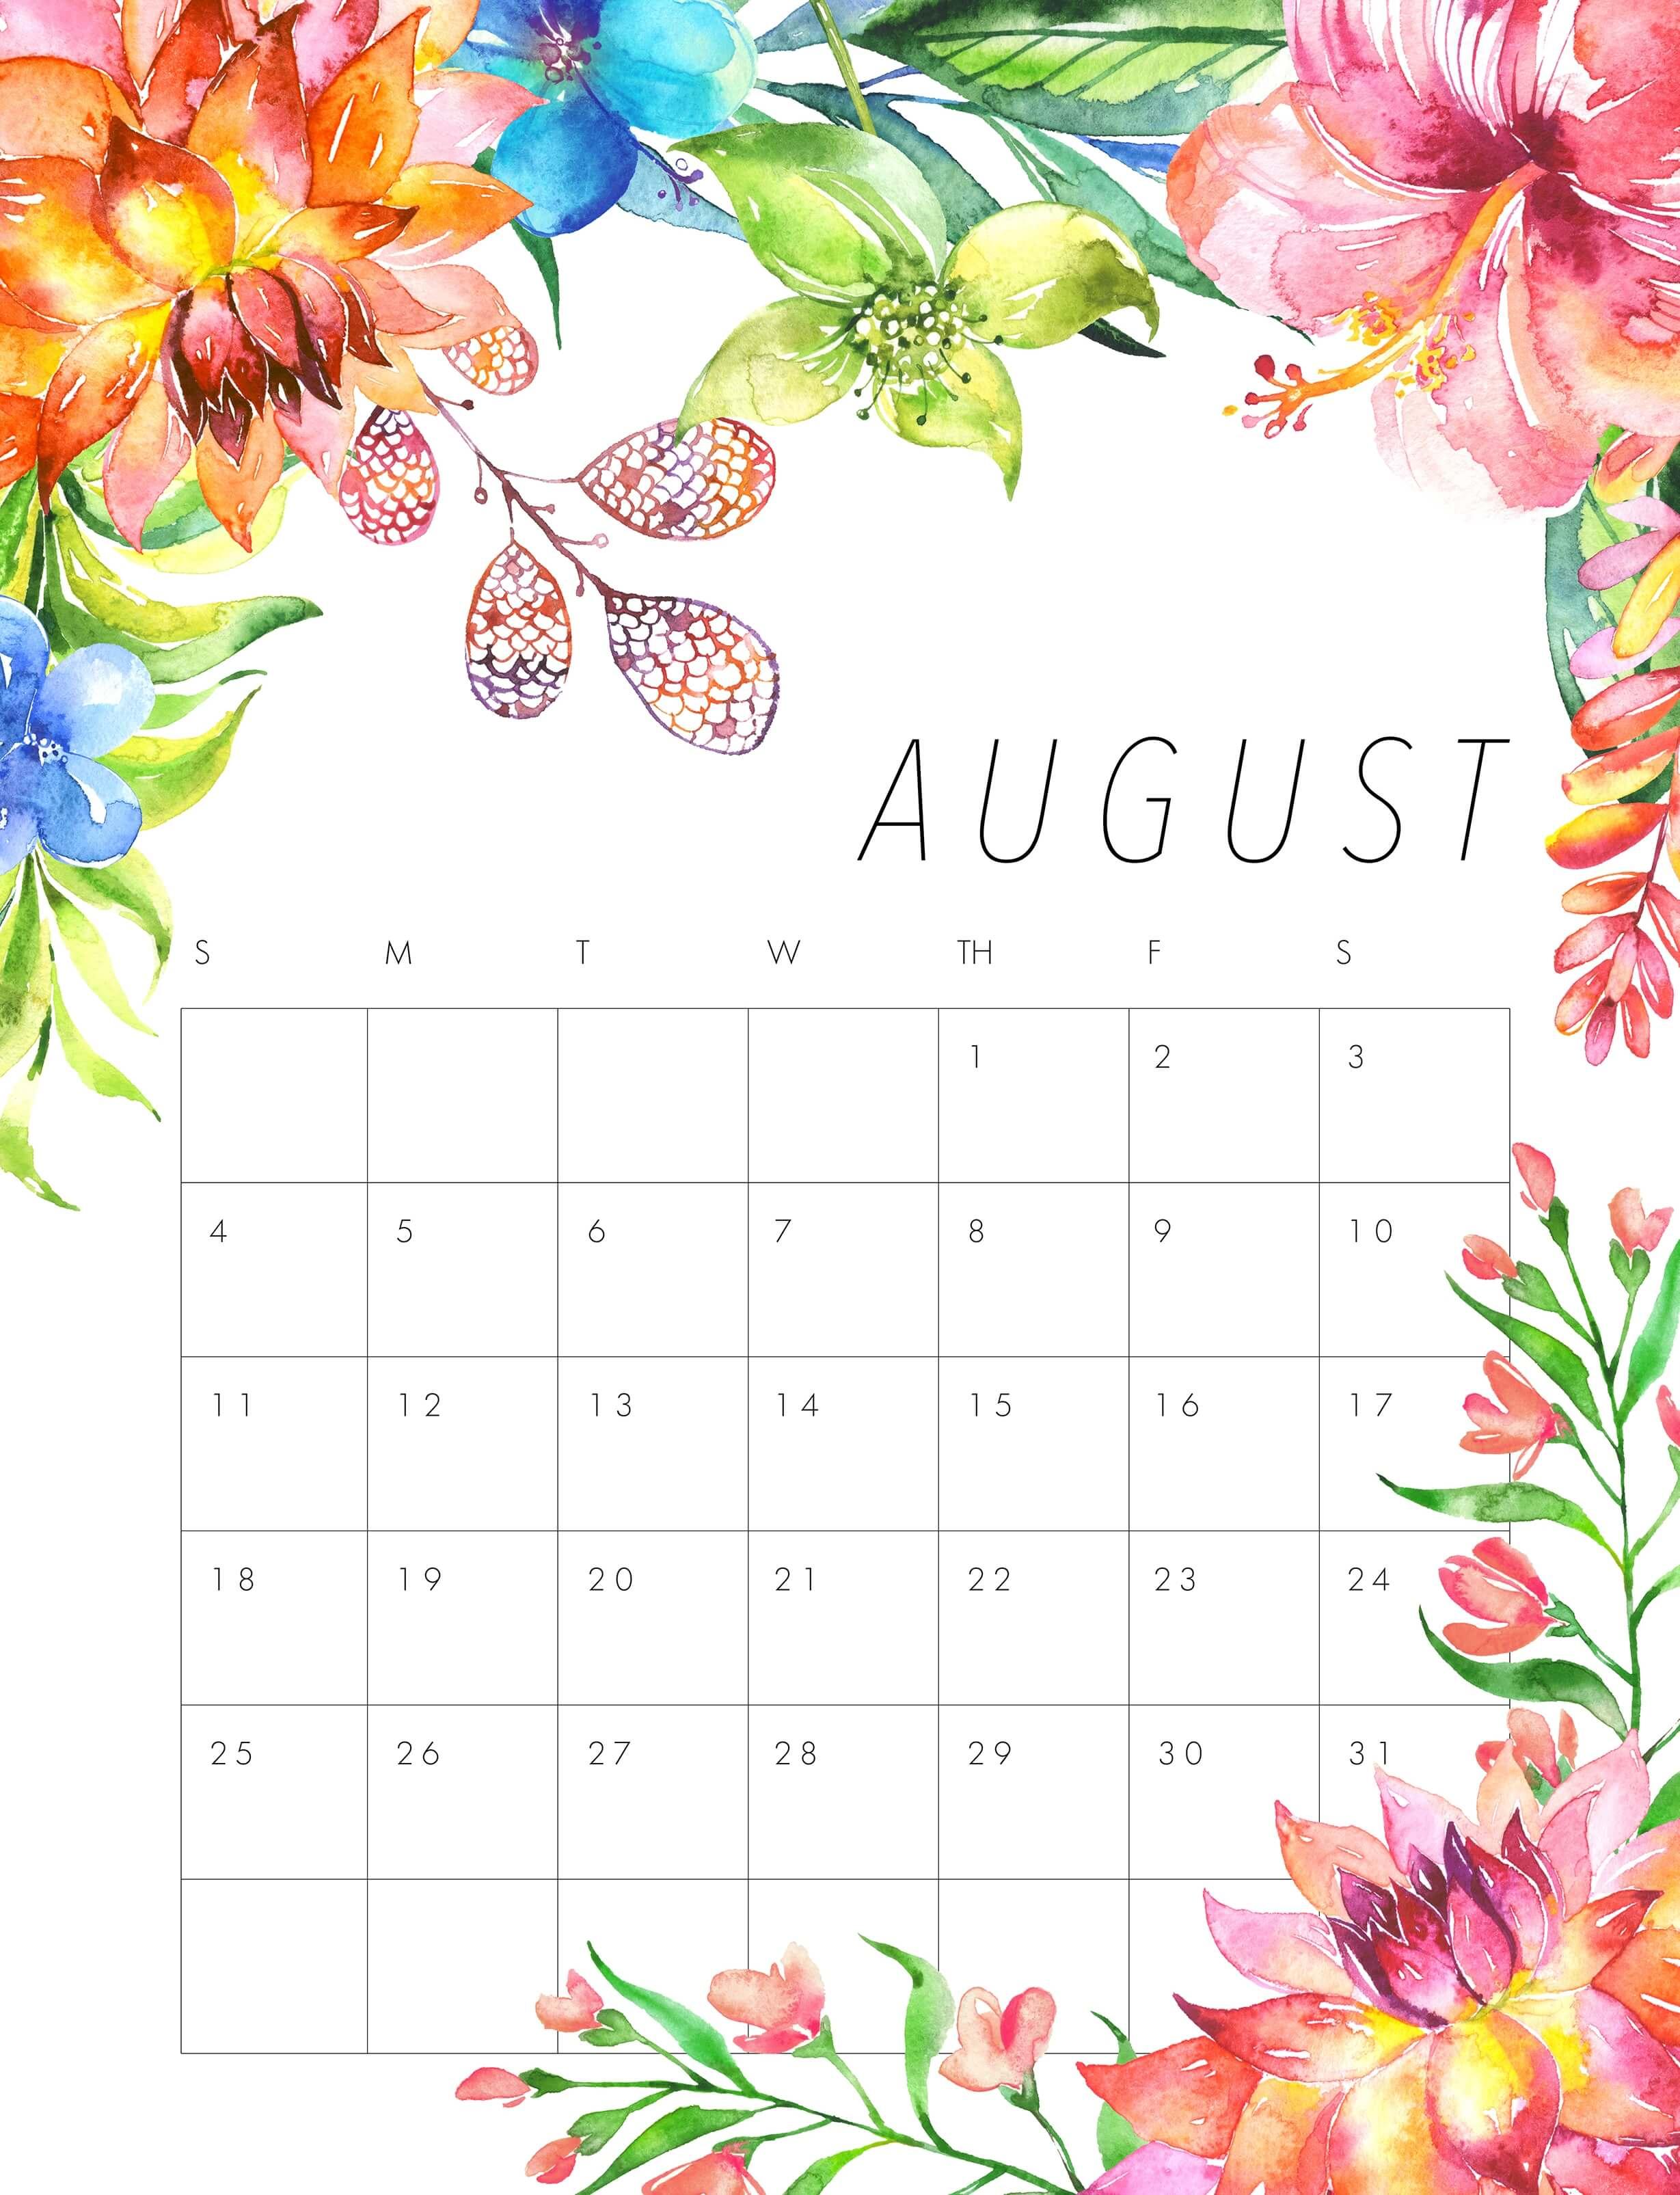 Cute August 2019 Calendar Floral Design